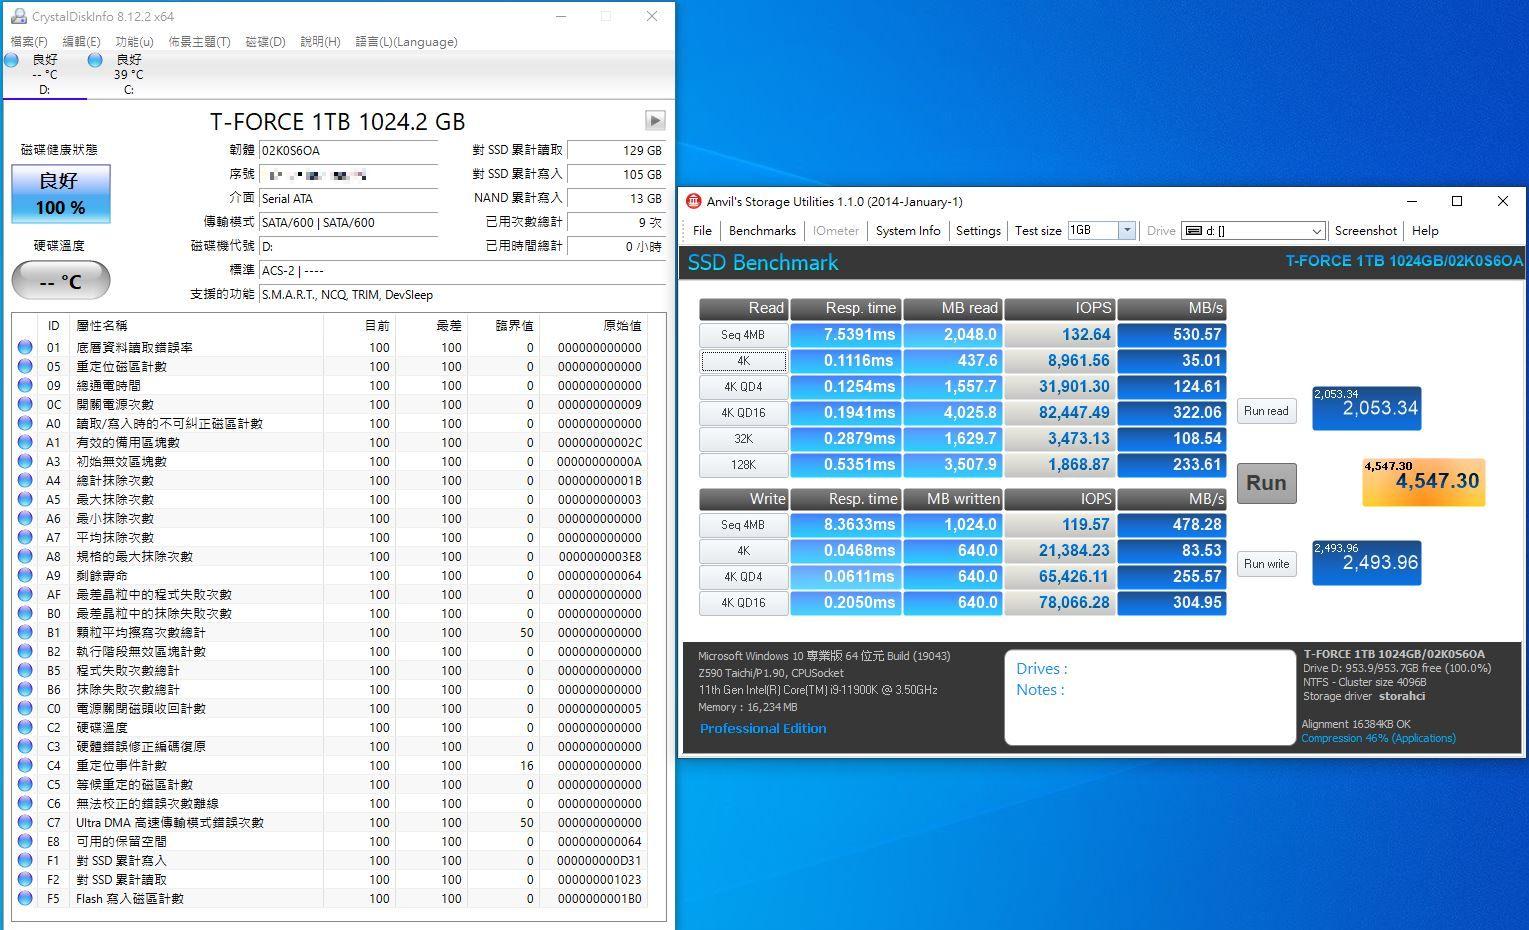 十銓T-FORCE DELTA MAX WHITE RGB SSD固態硬碟-ARGB發光還不夠,白...2086